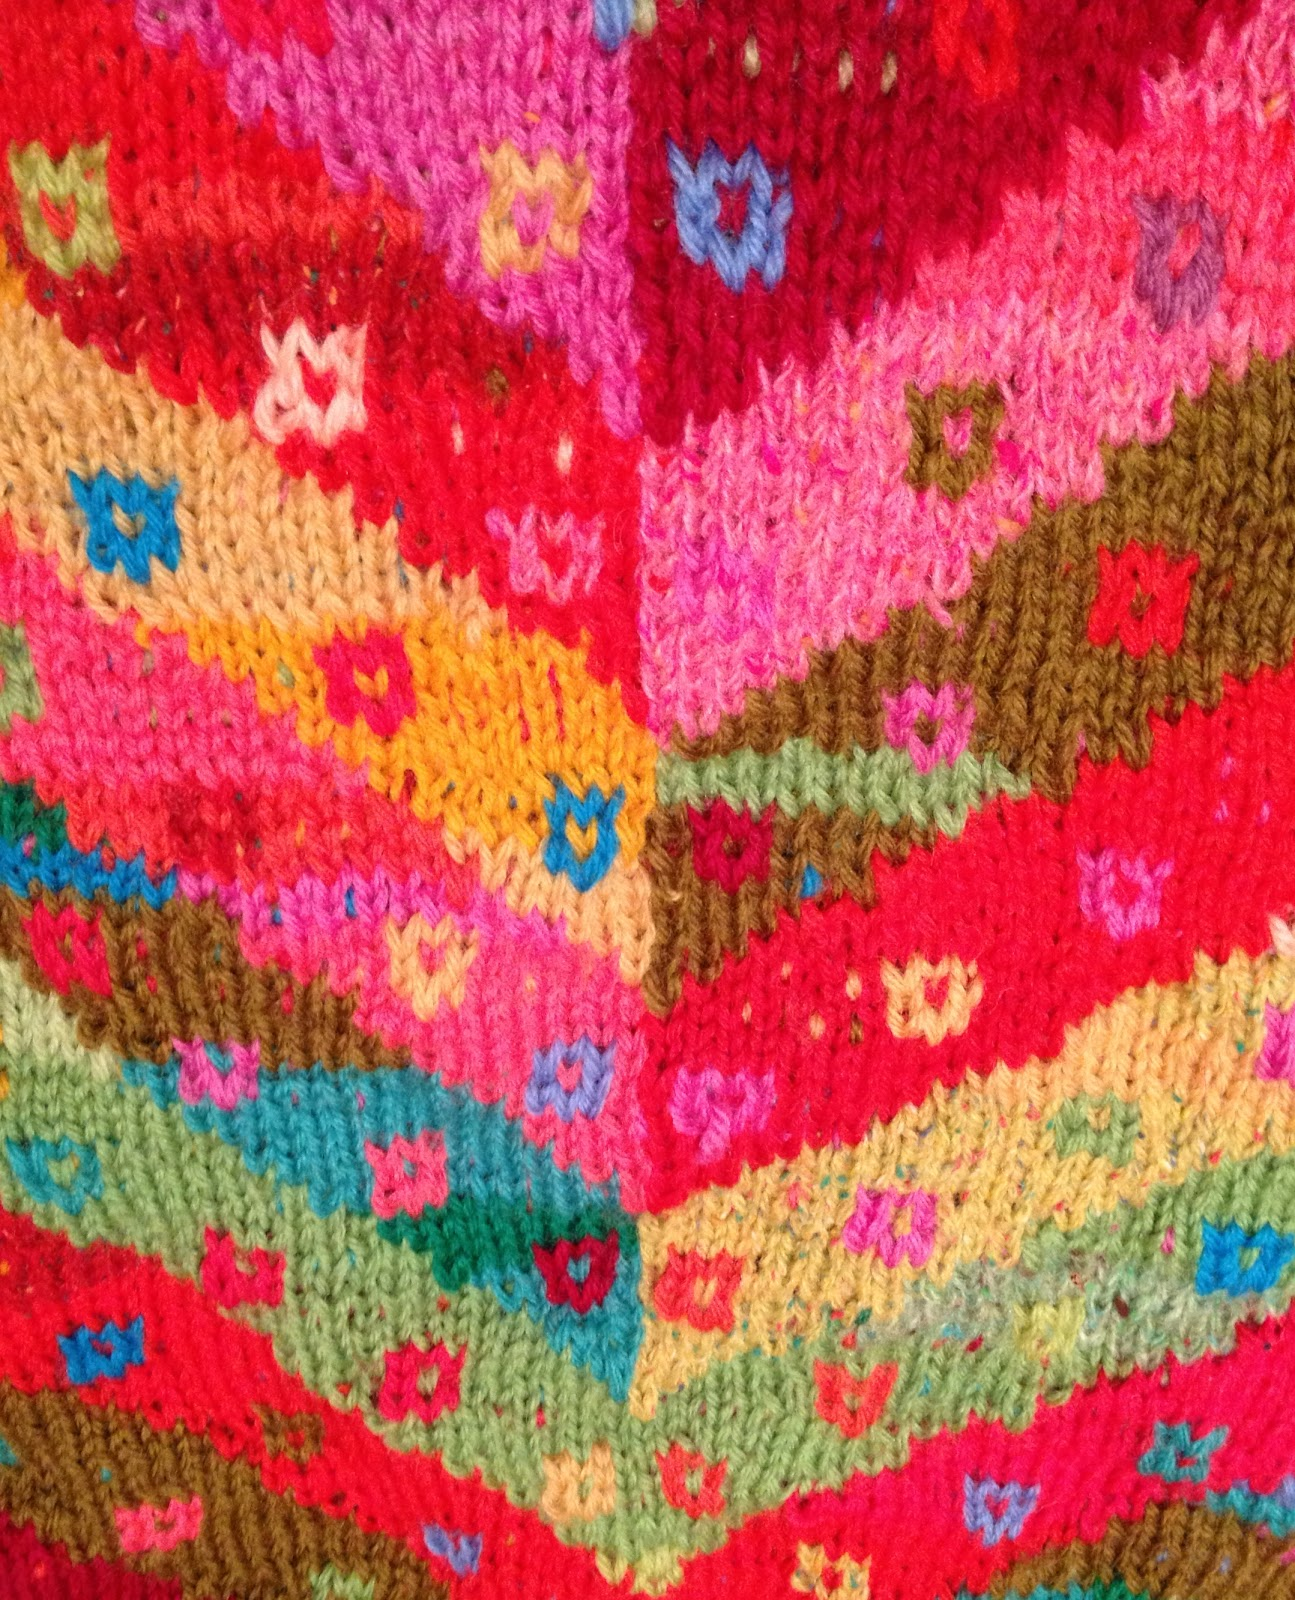 Kaffe Fassett Knitting Kits : Emma vining hand knitting